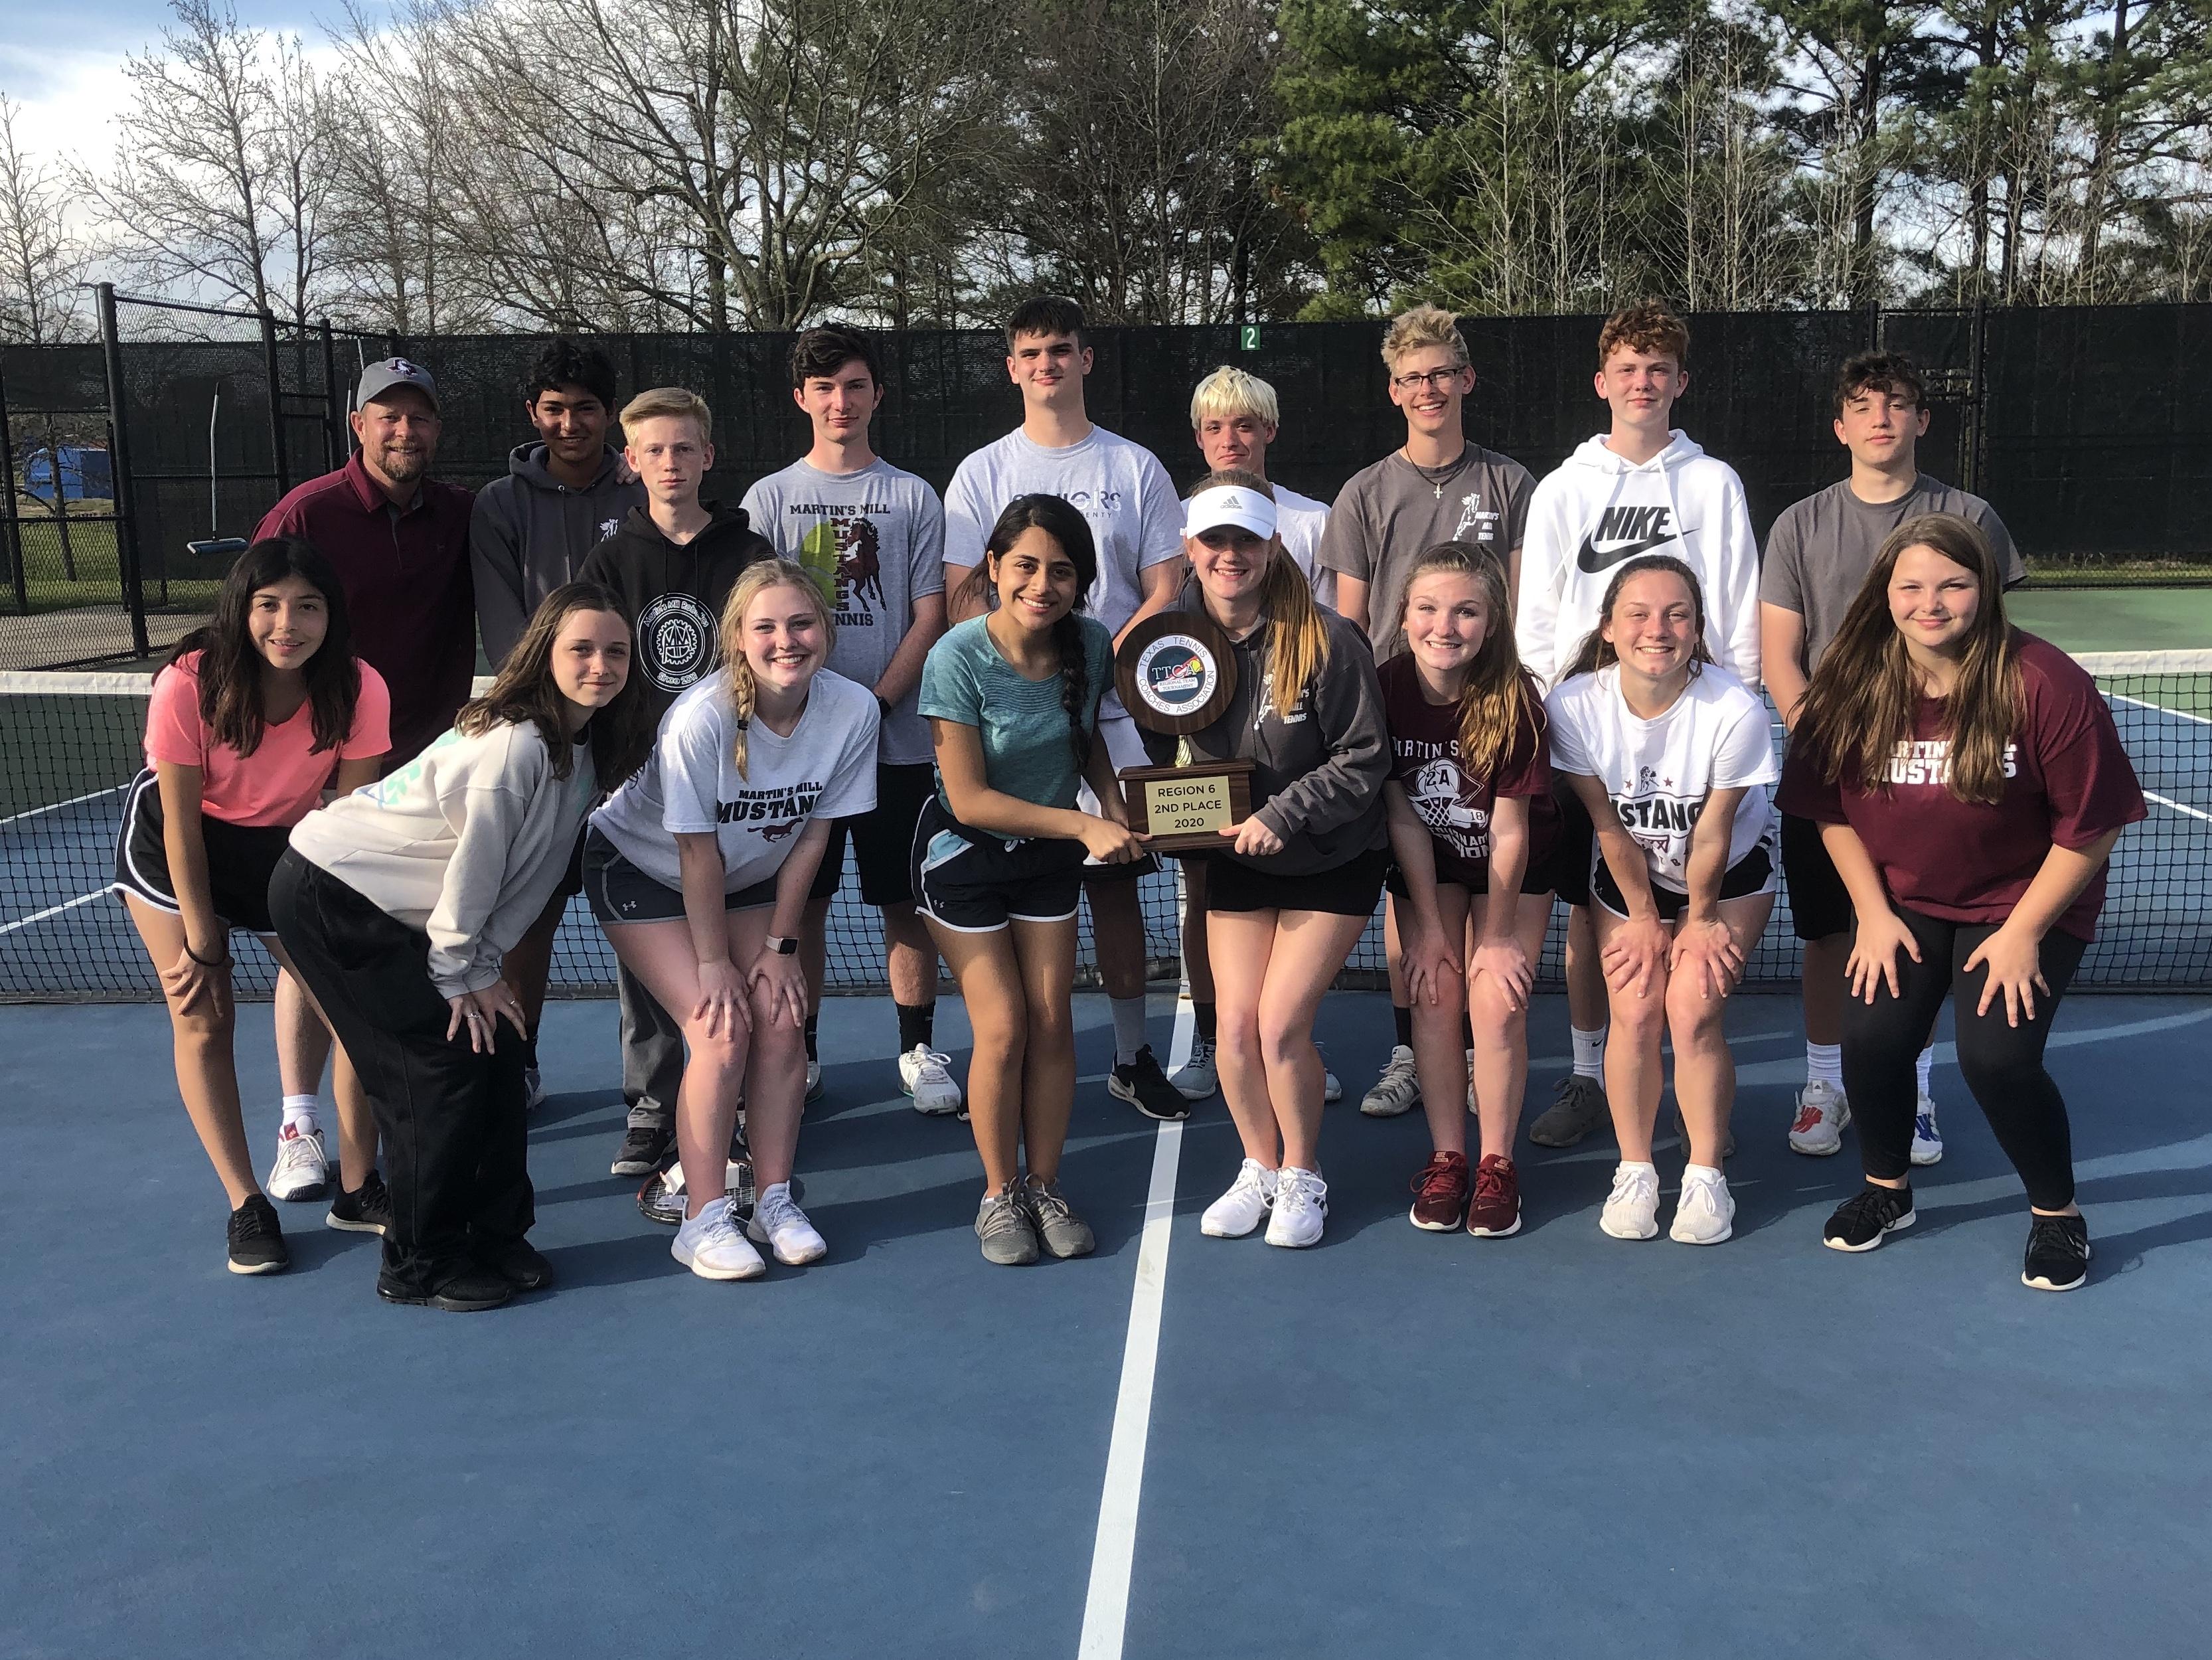 TTCA Team Tennis - Region 6 - 2nd Place